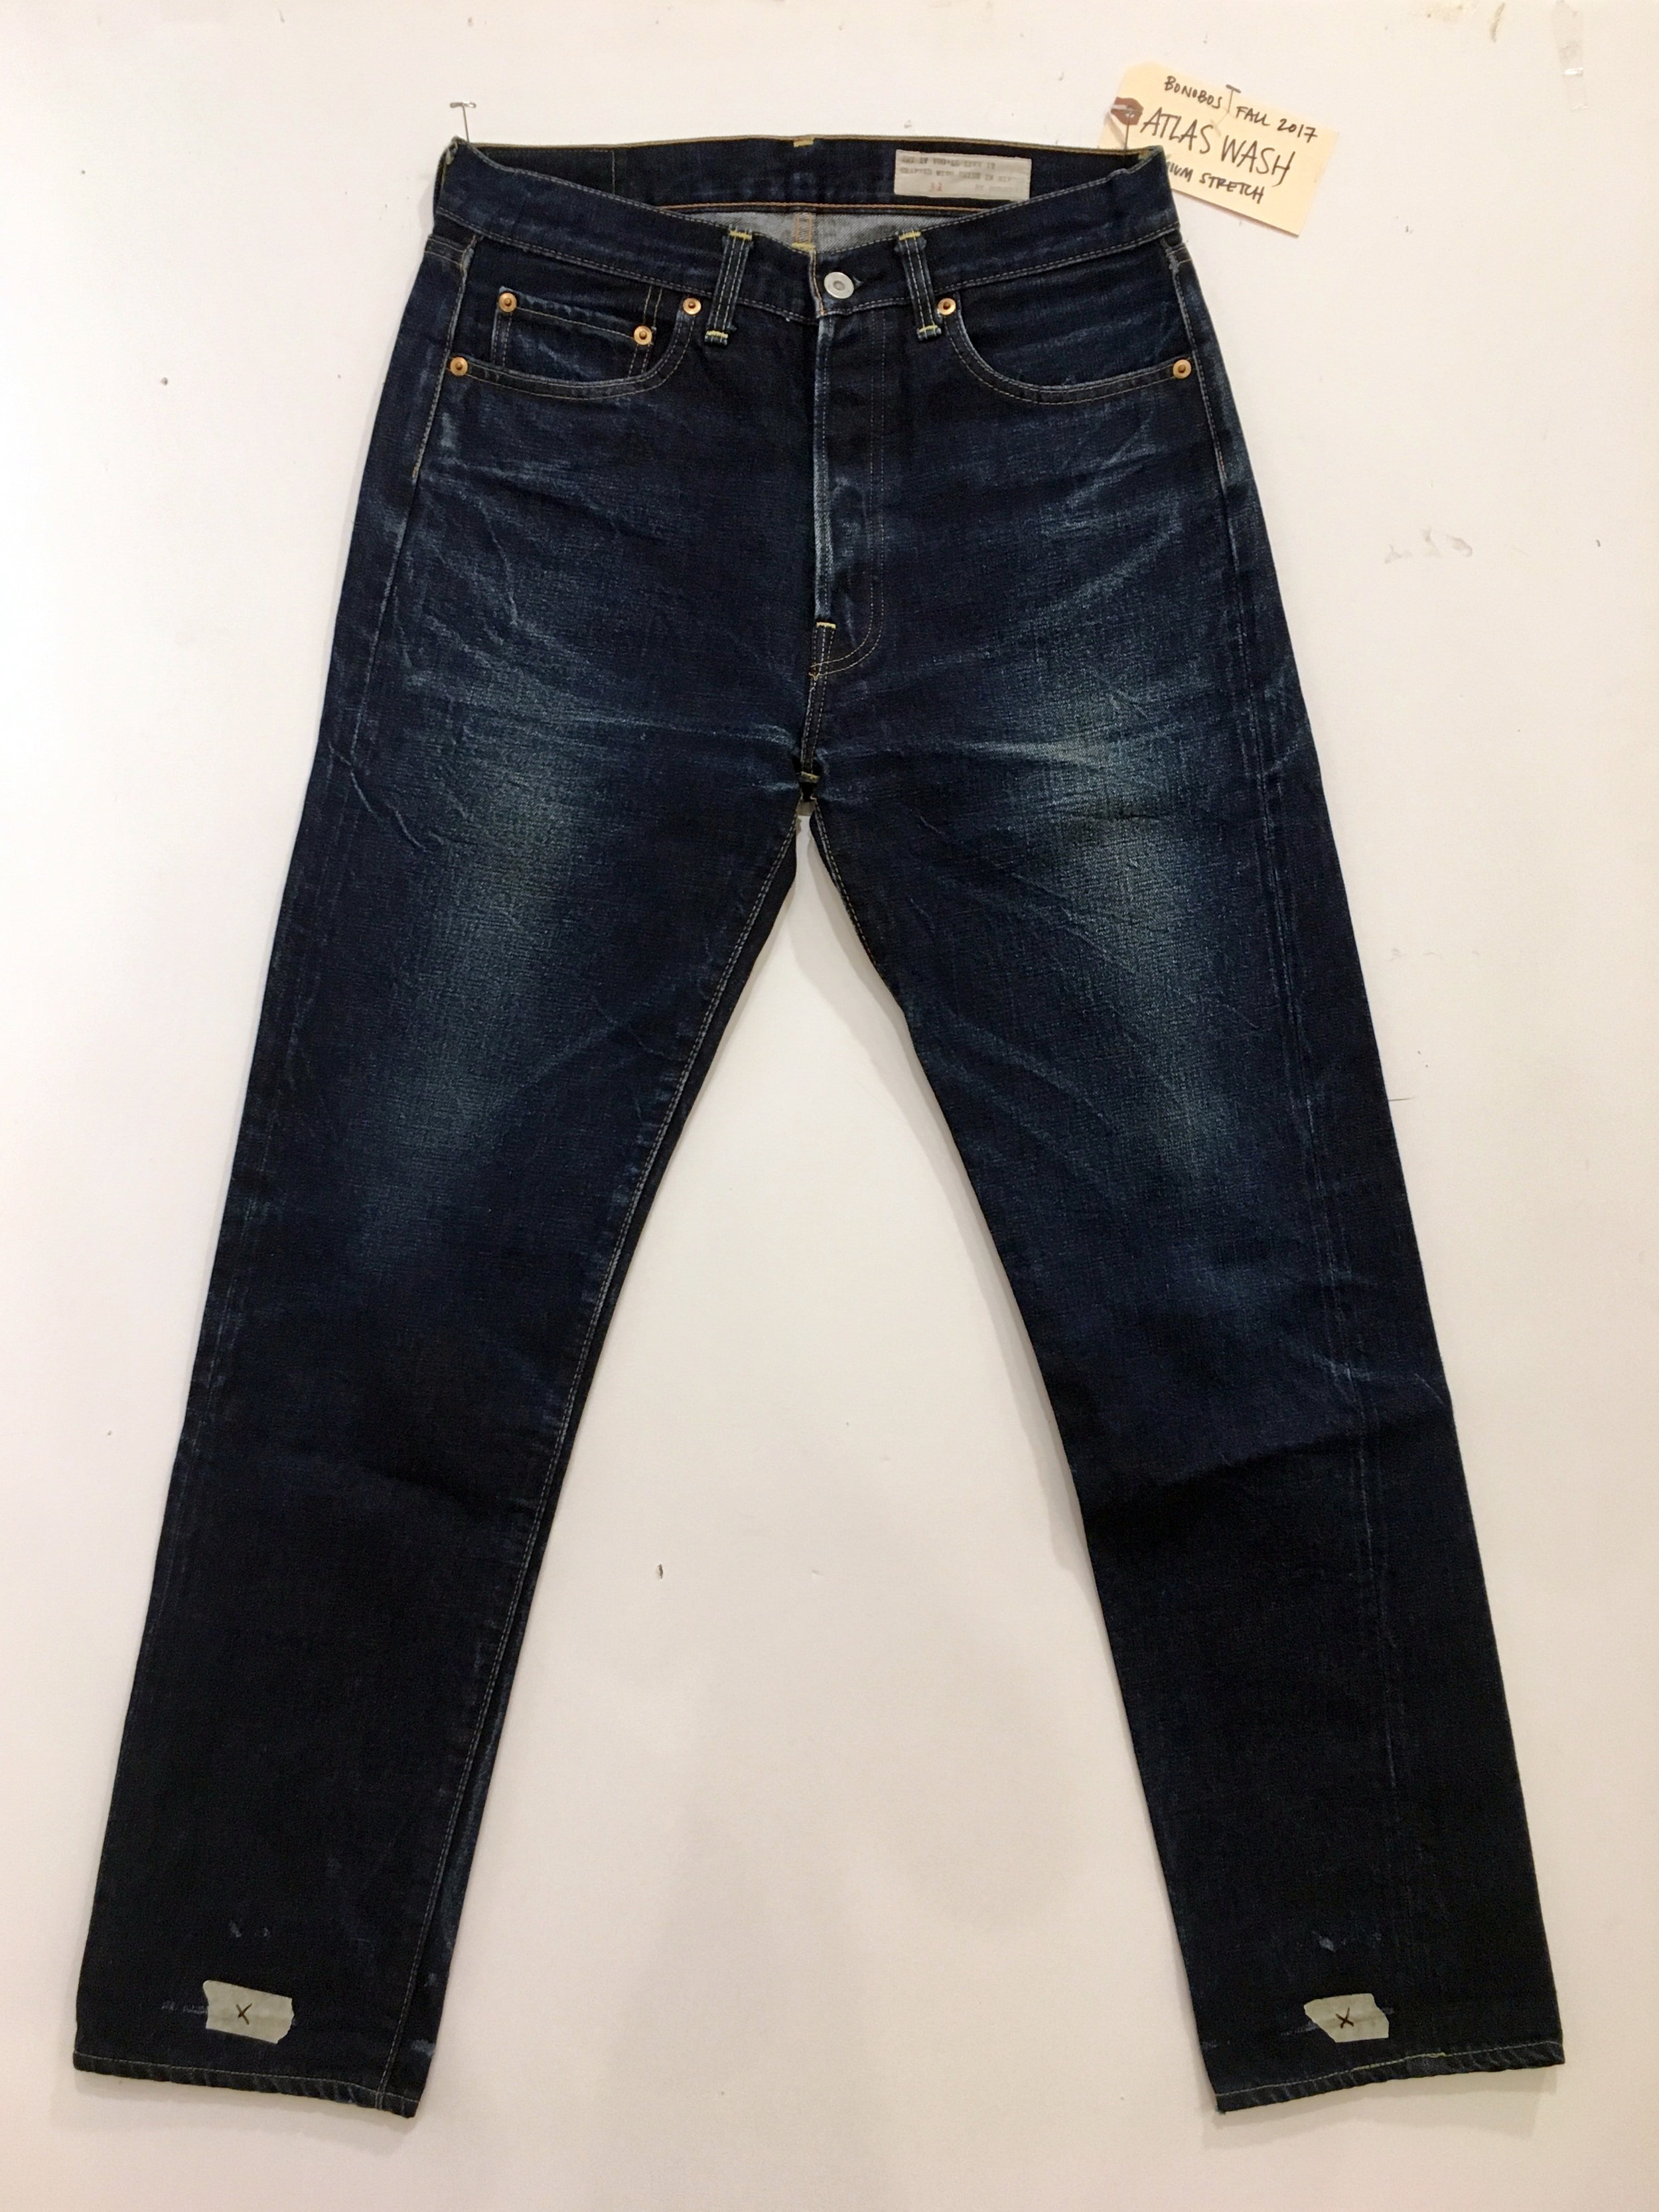 bonobos-indigo-medium-wash-jeans